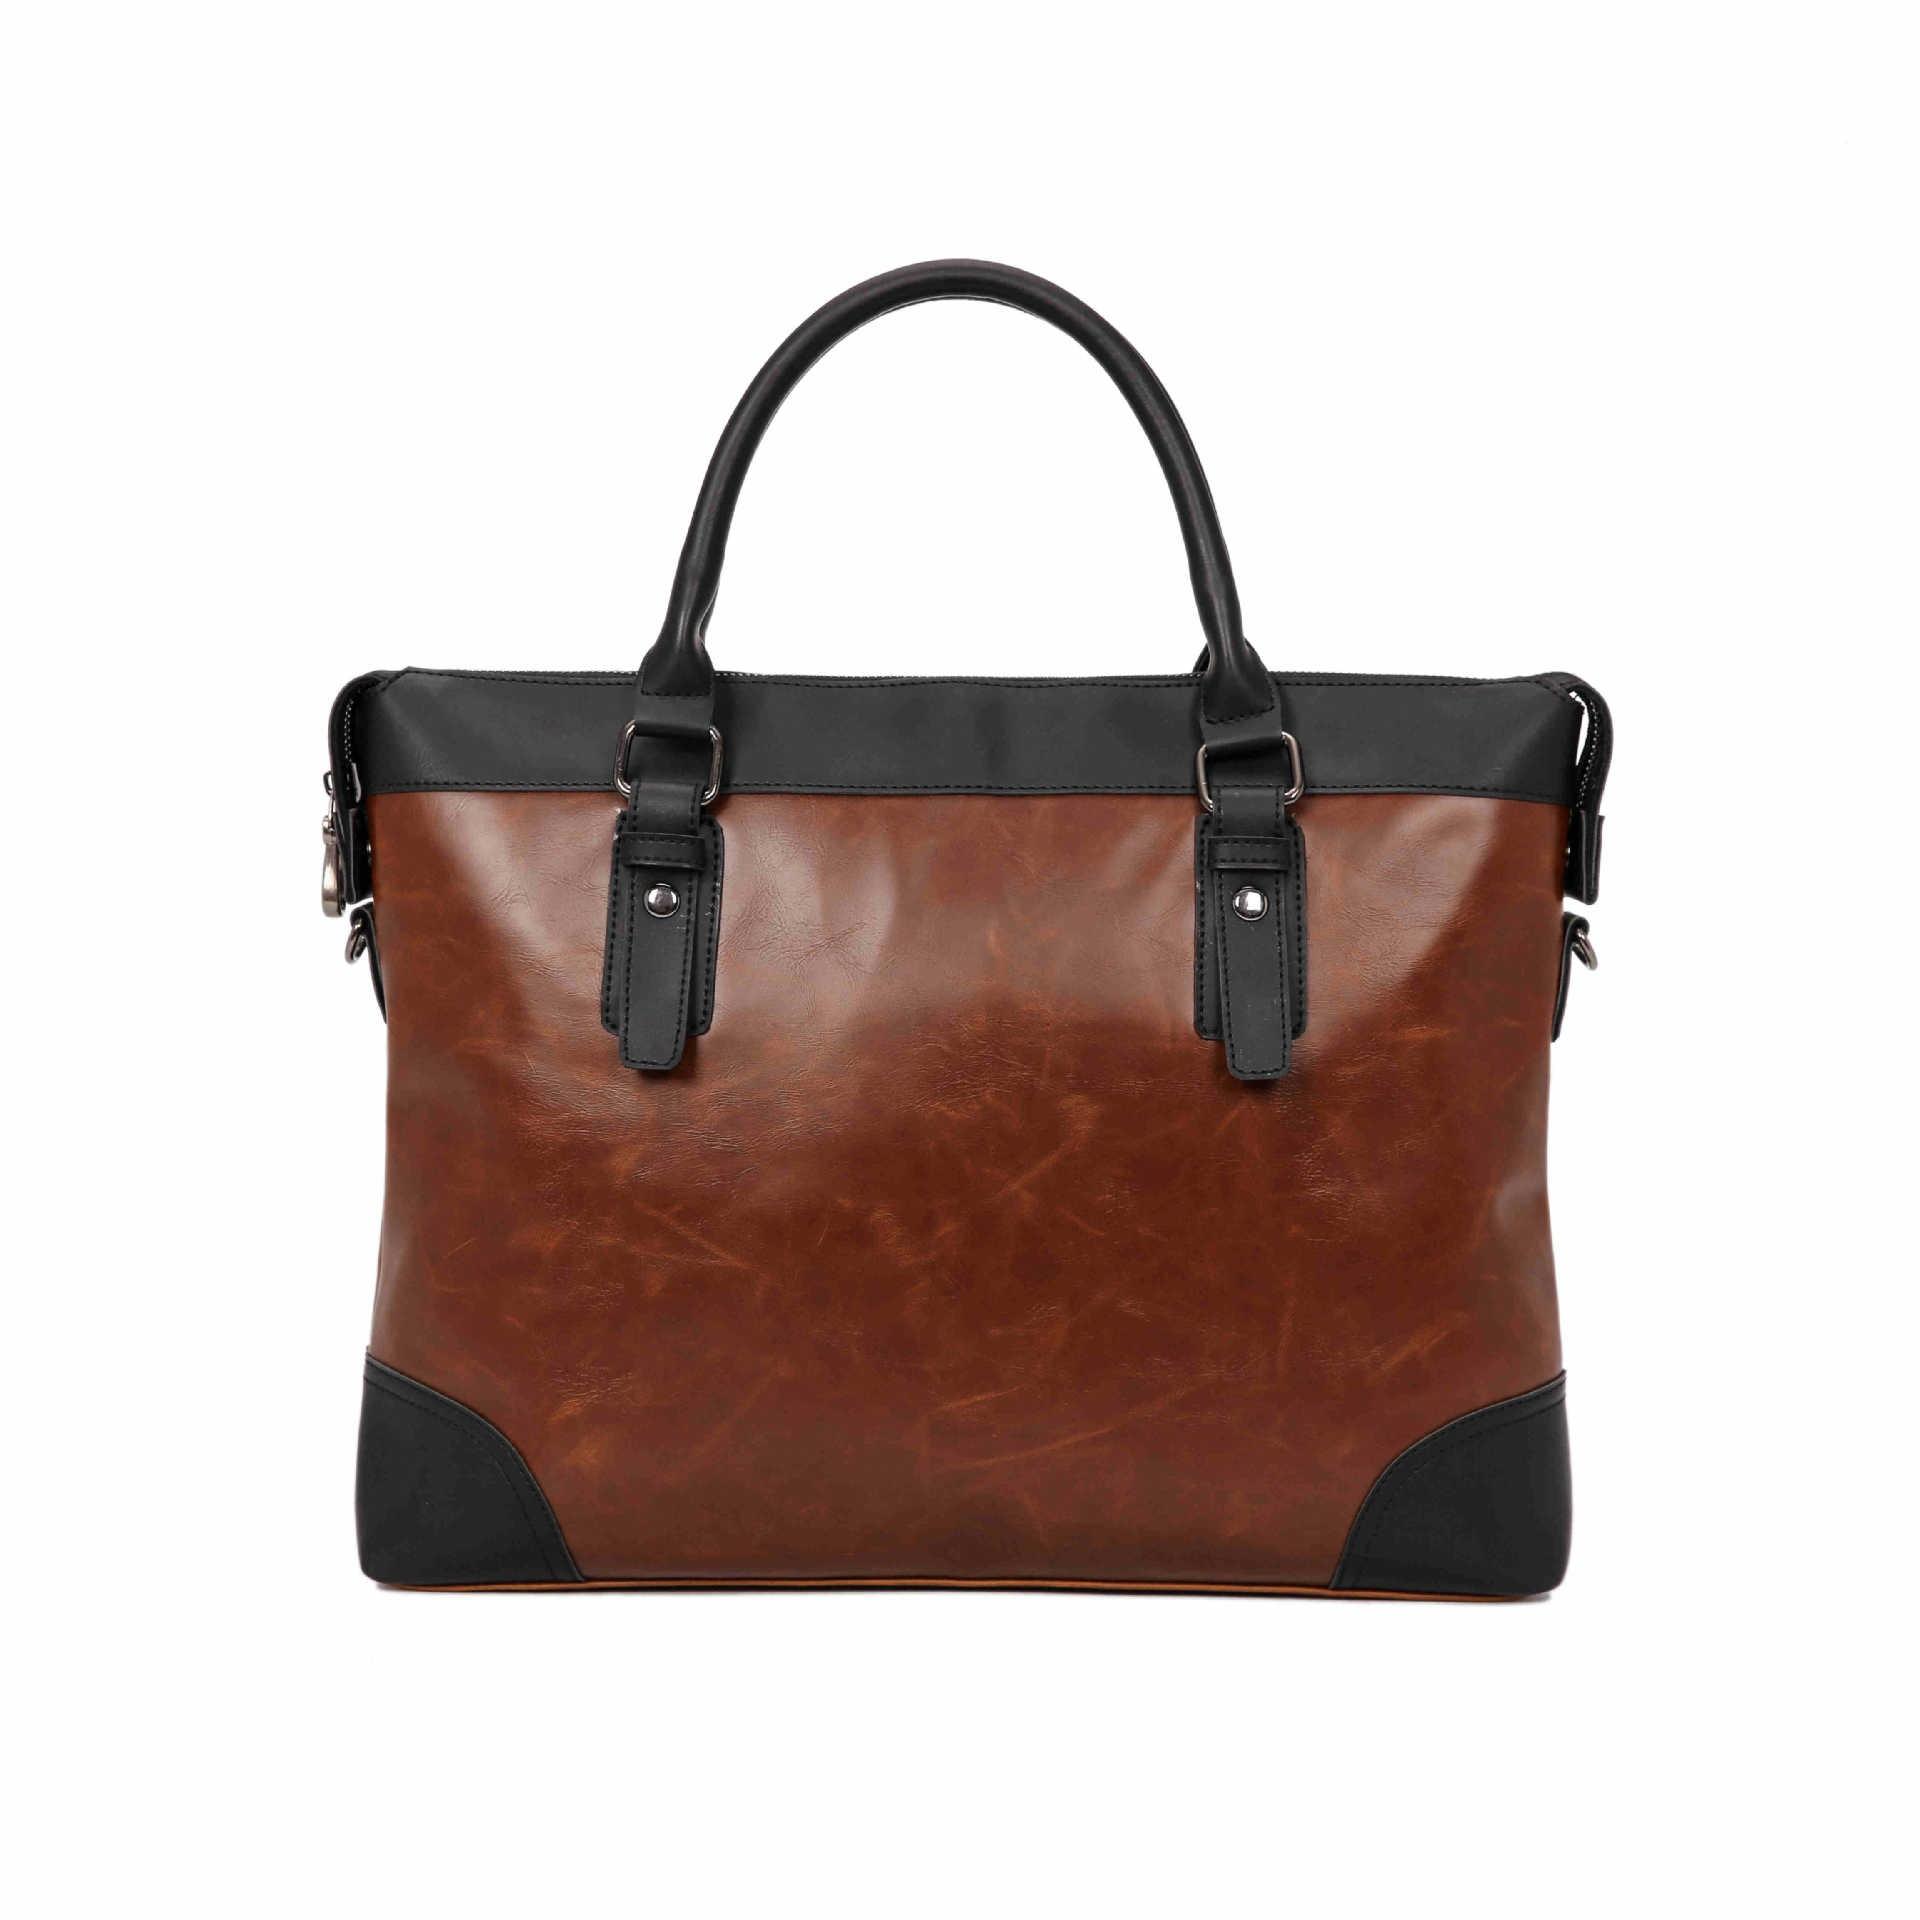 2019 New Leather Men Bag Leisure Men's Business Messenger Bags Portable Briefcase Bag Laptop 14 Inch Leather Handbag